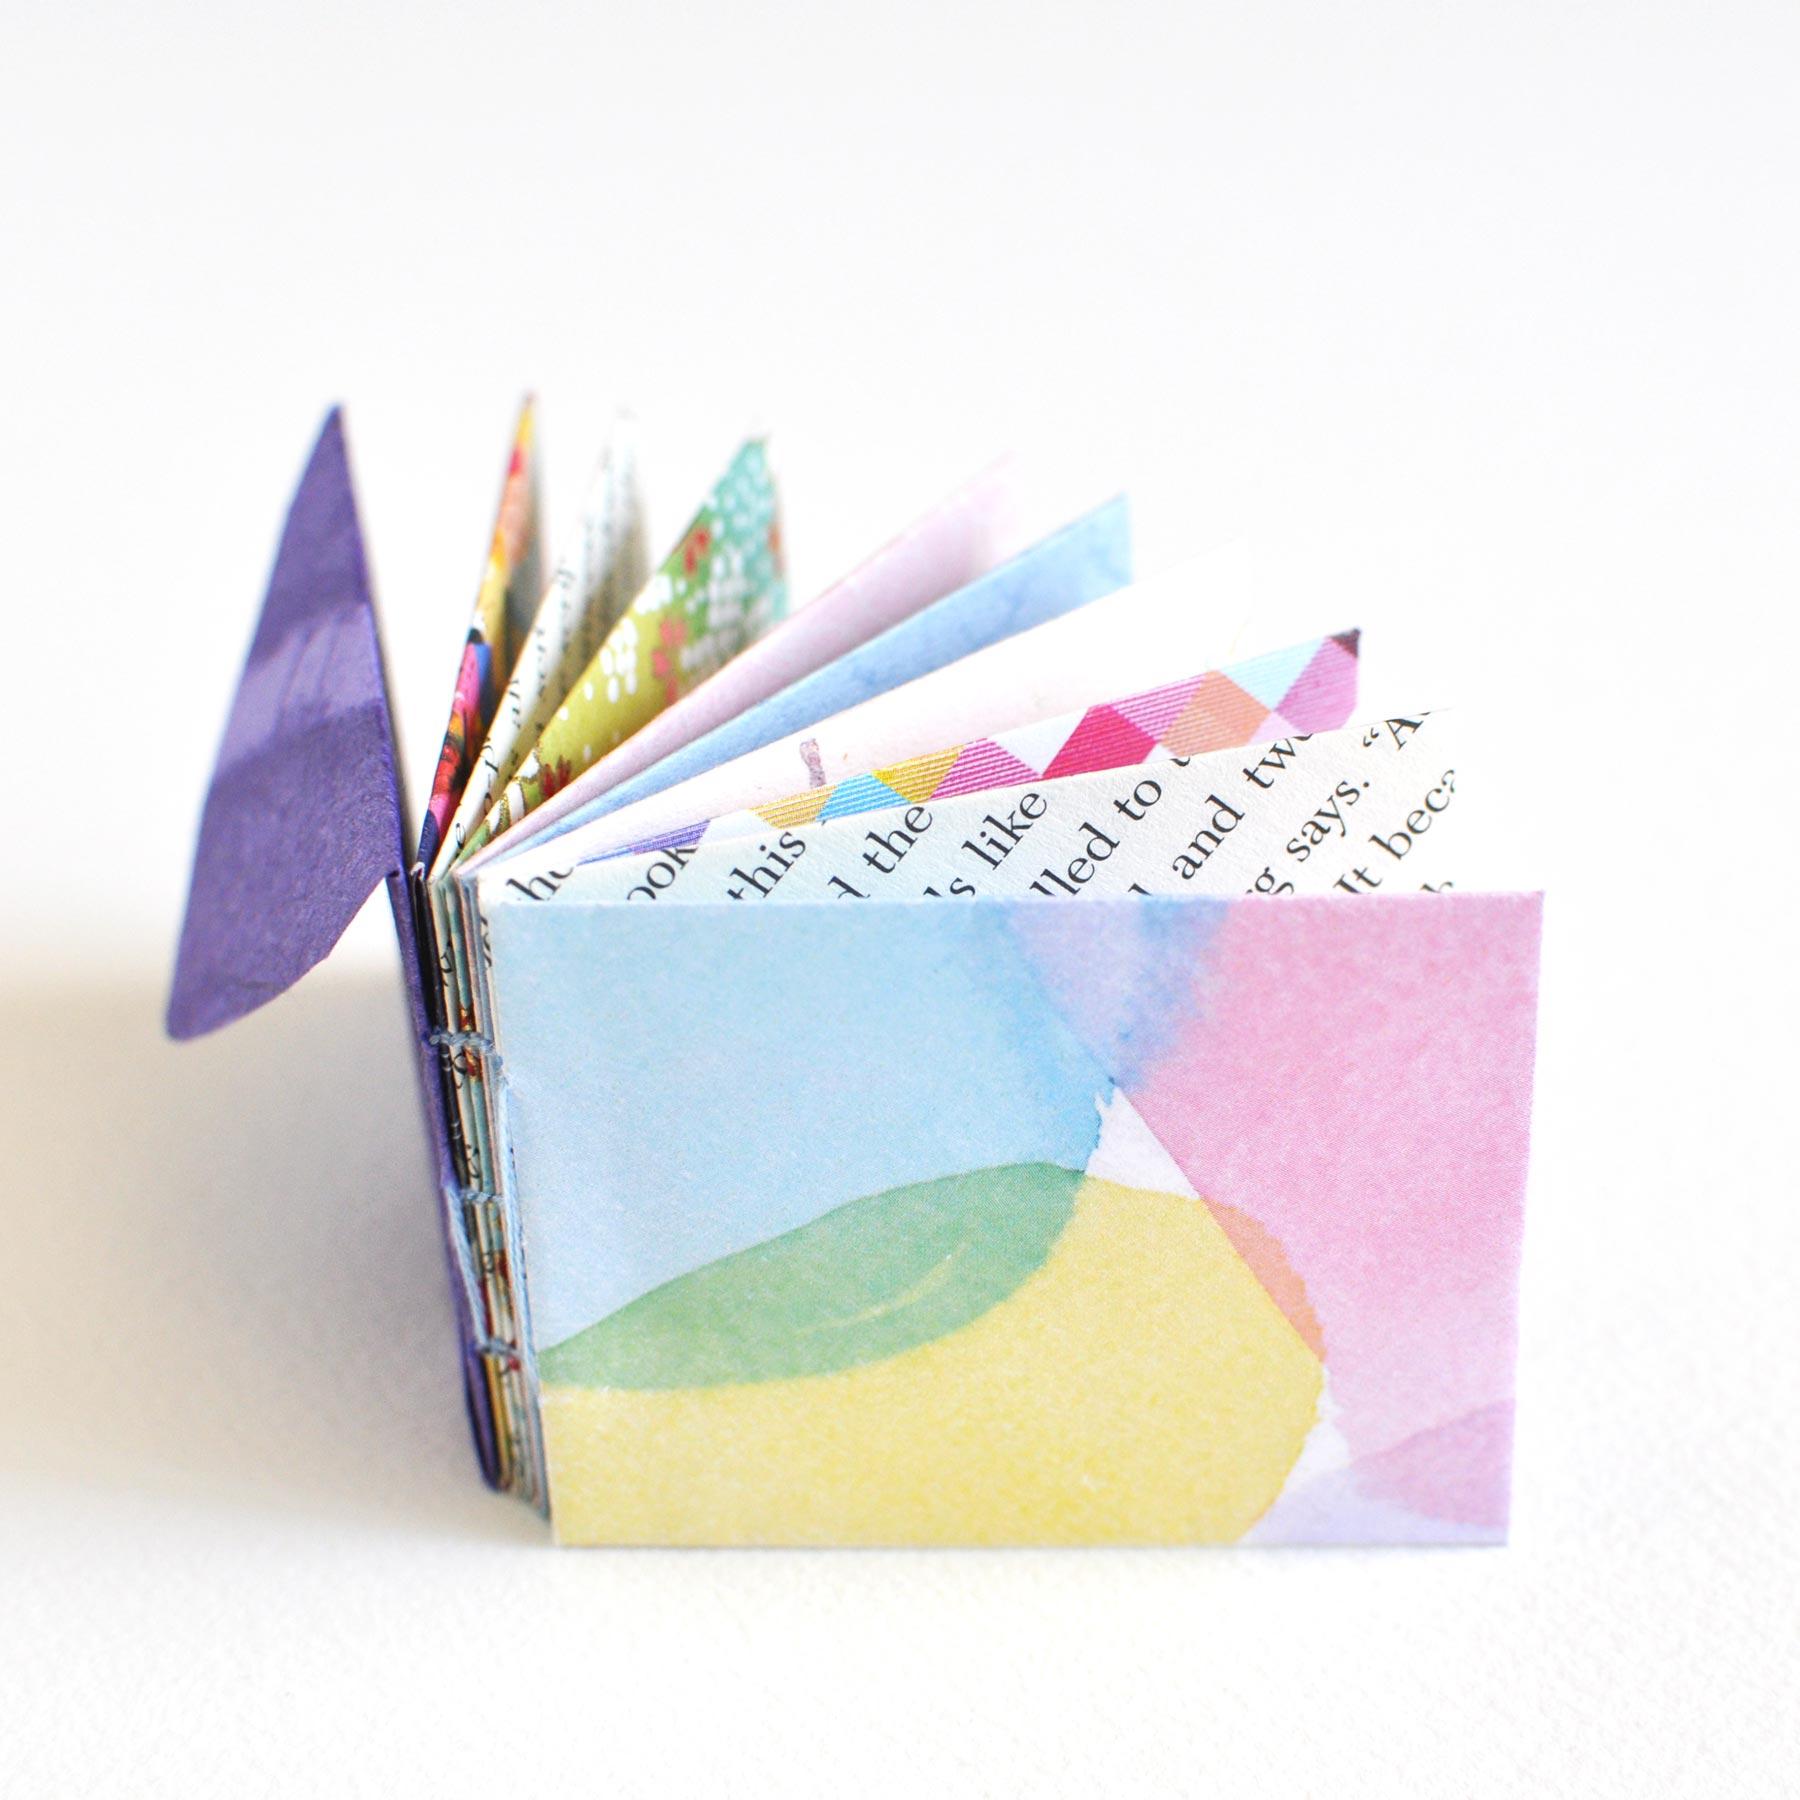 Envelope-Journal-Image-7.jpg